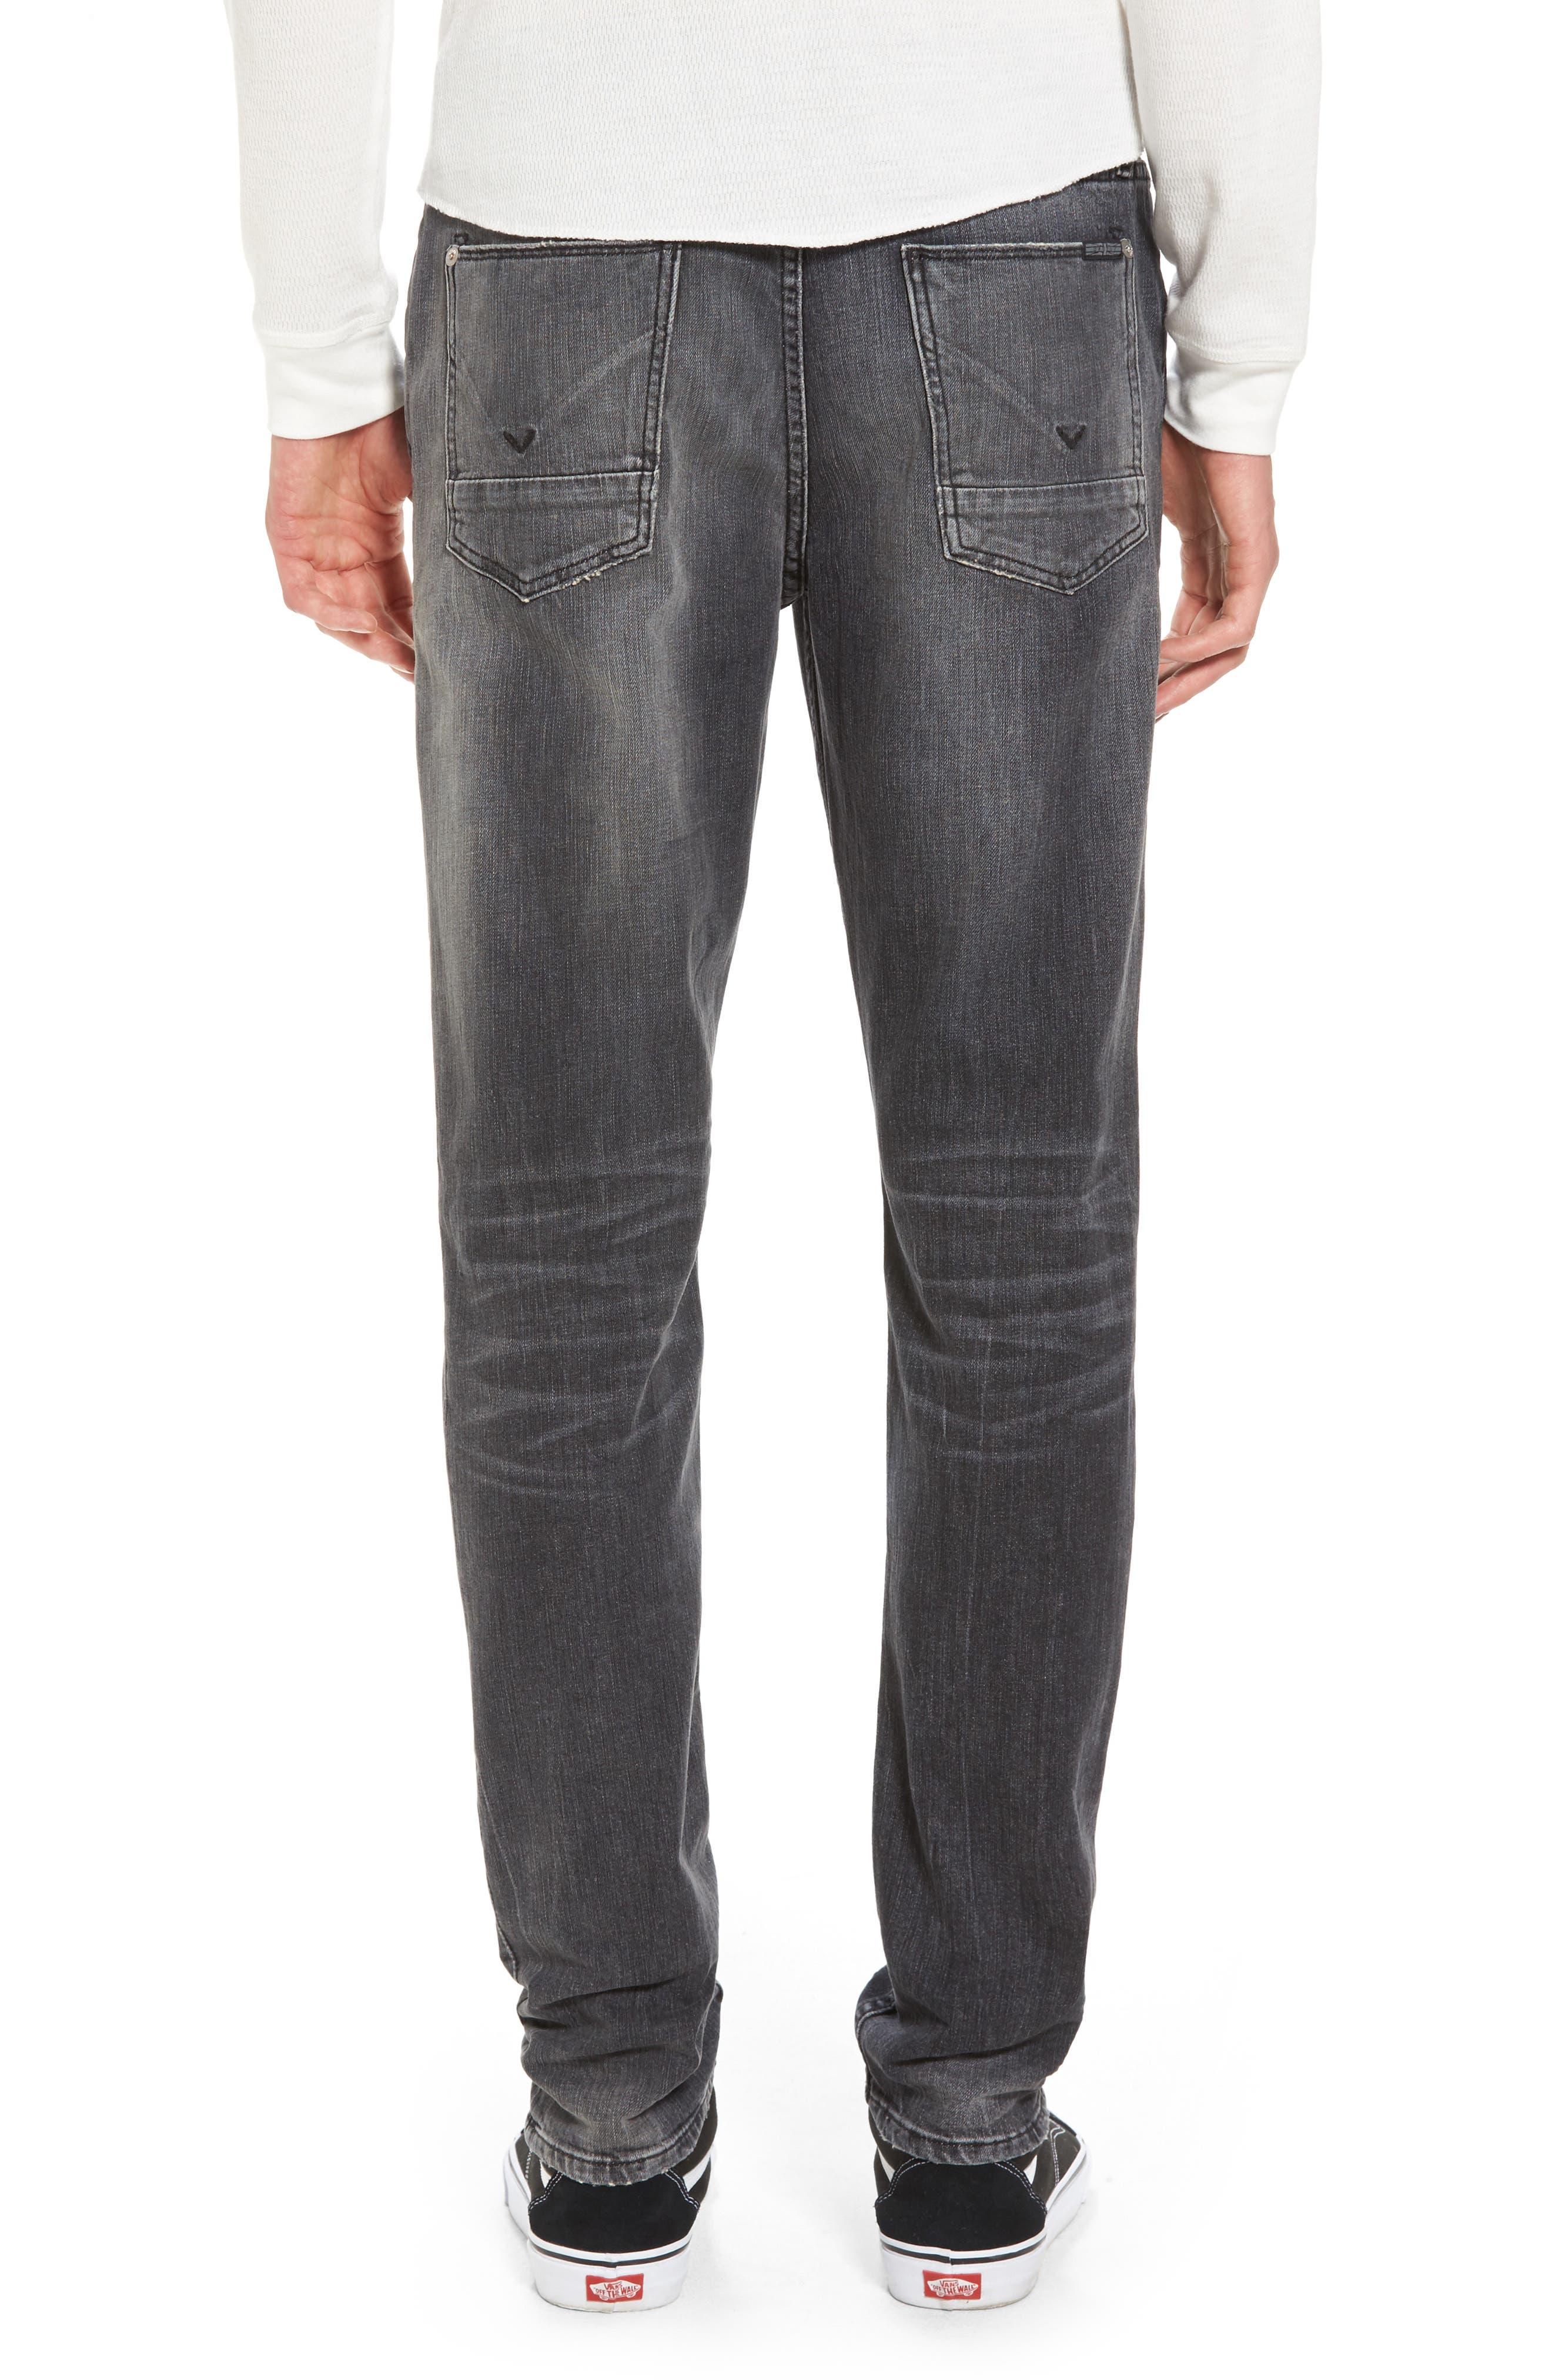 Axl Skinny Fit Jeans,                             Alternate thumbnail 2, color,                             Venture